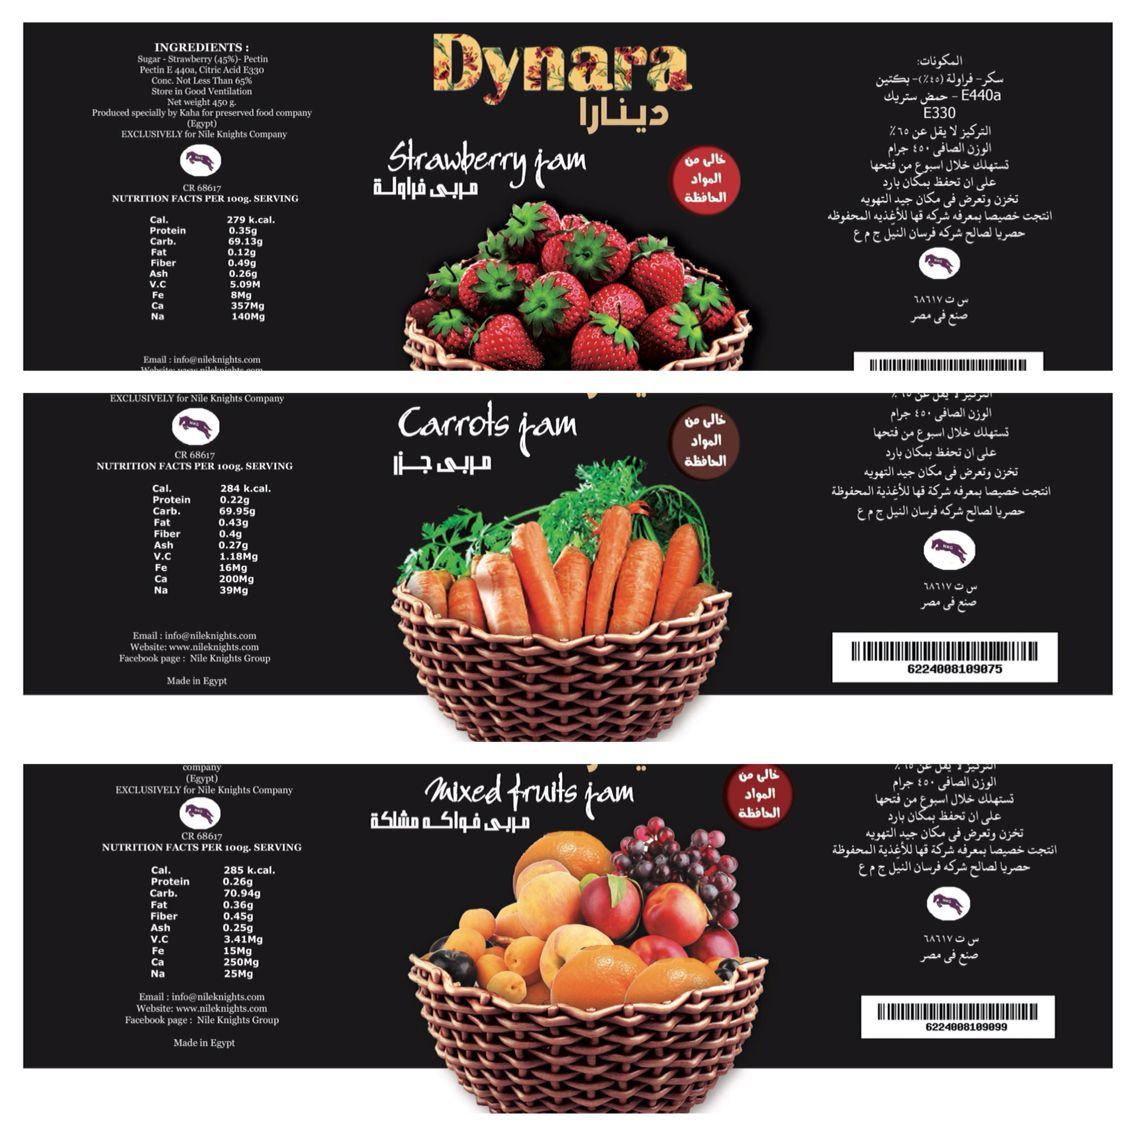 Dynara jam label design comcept